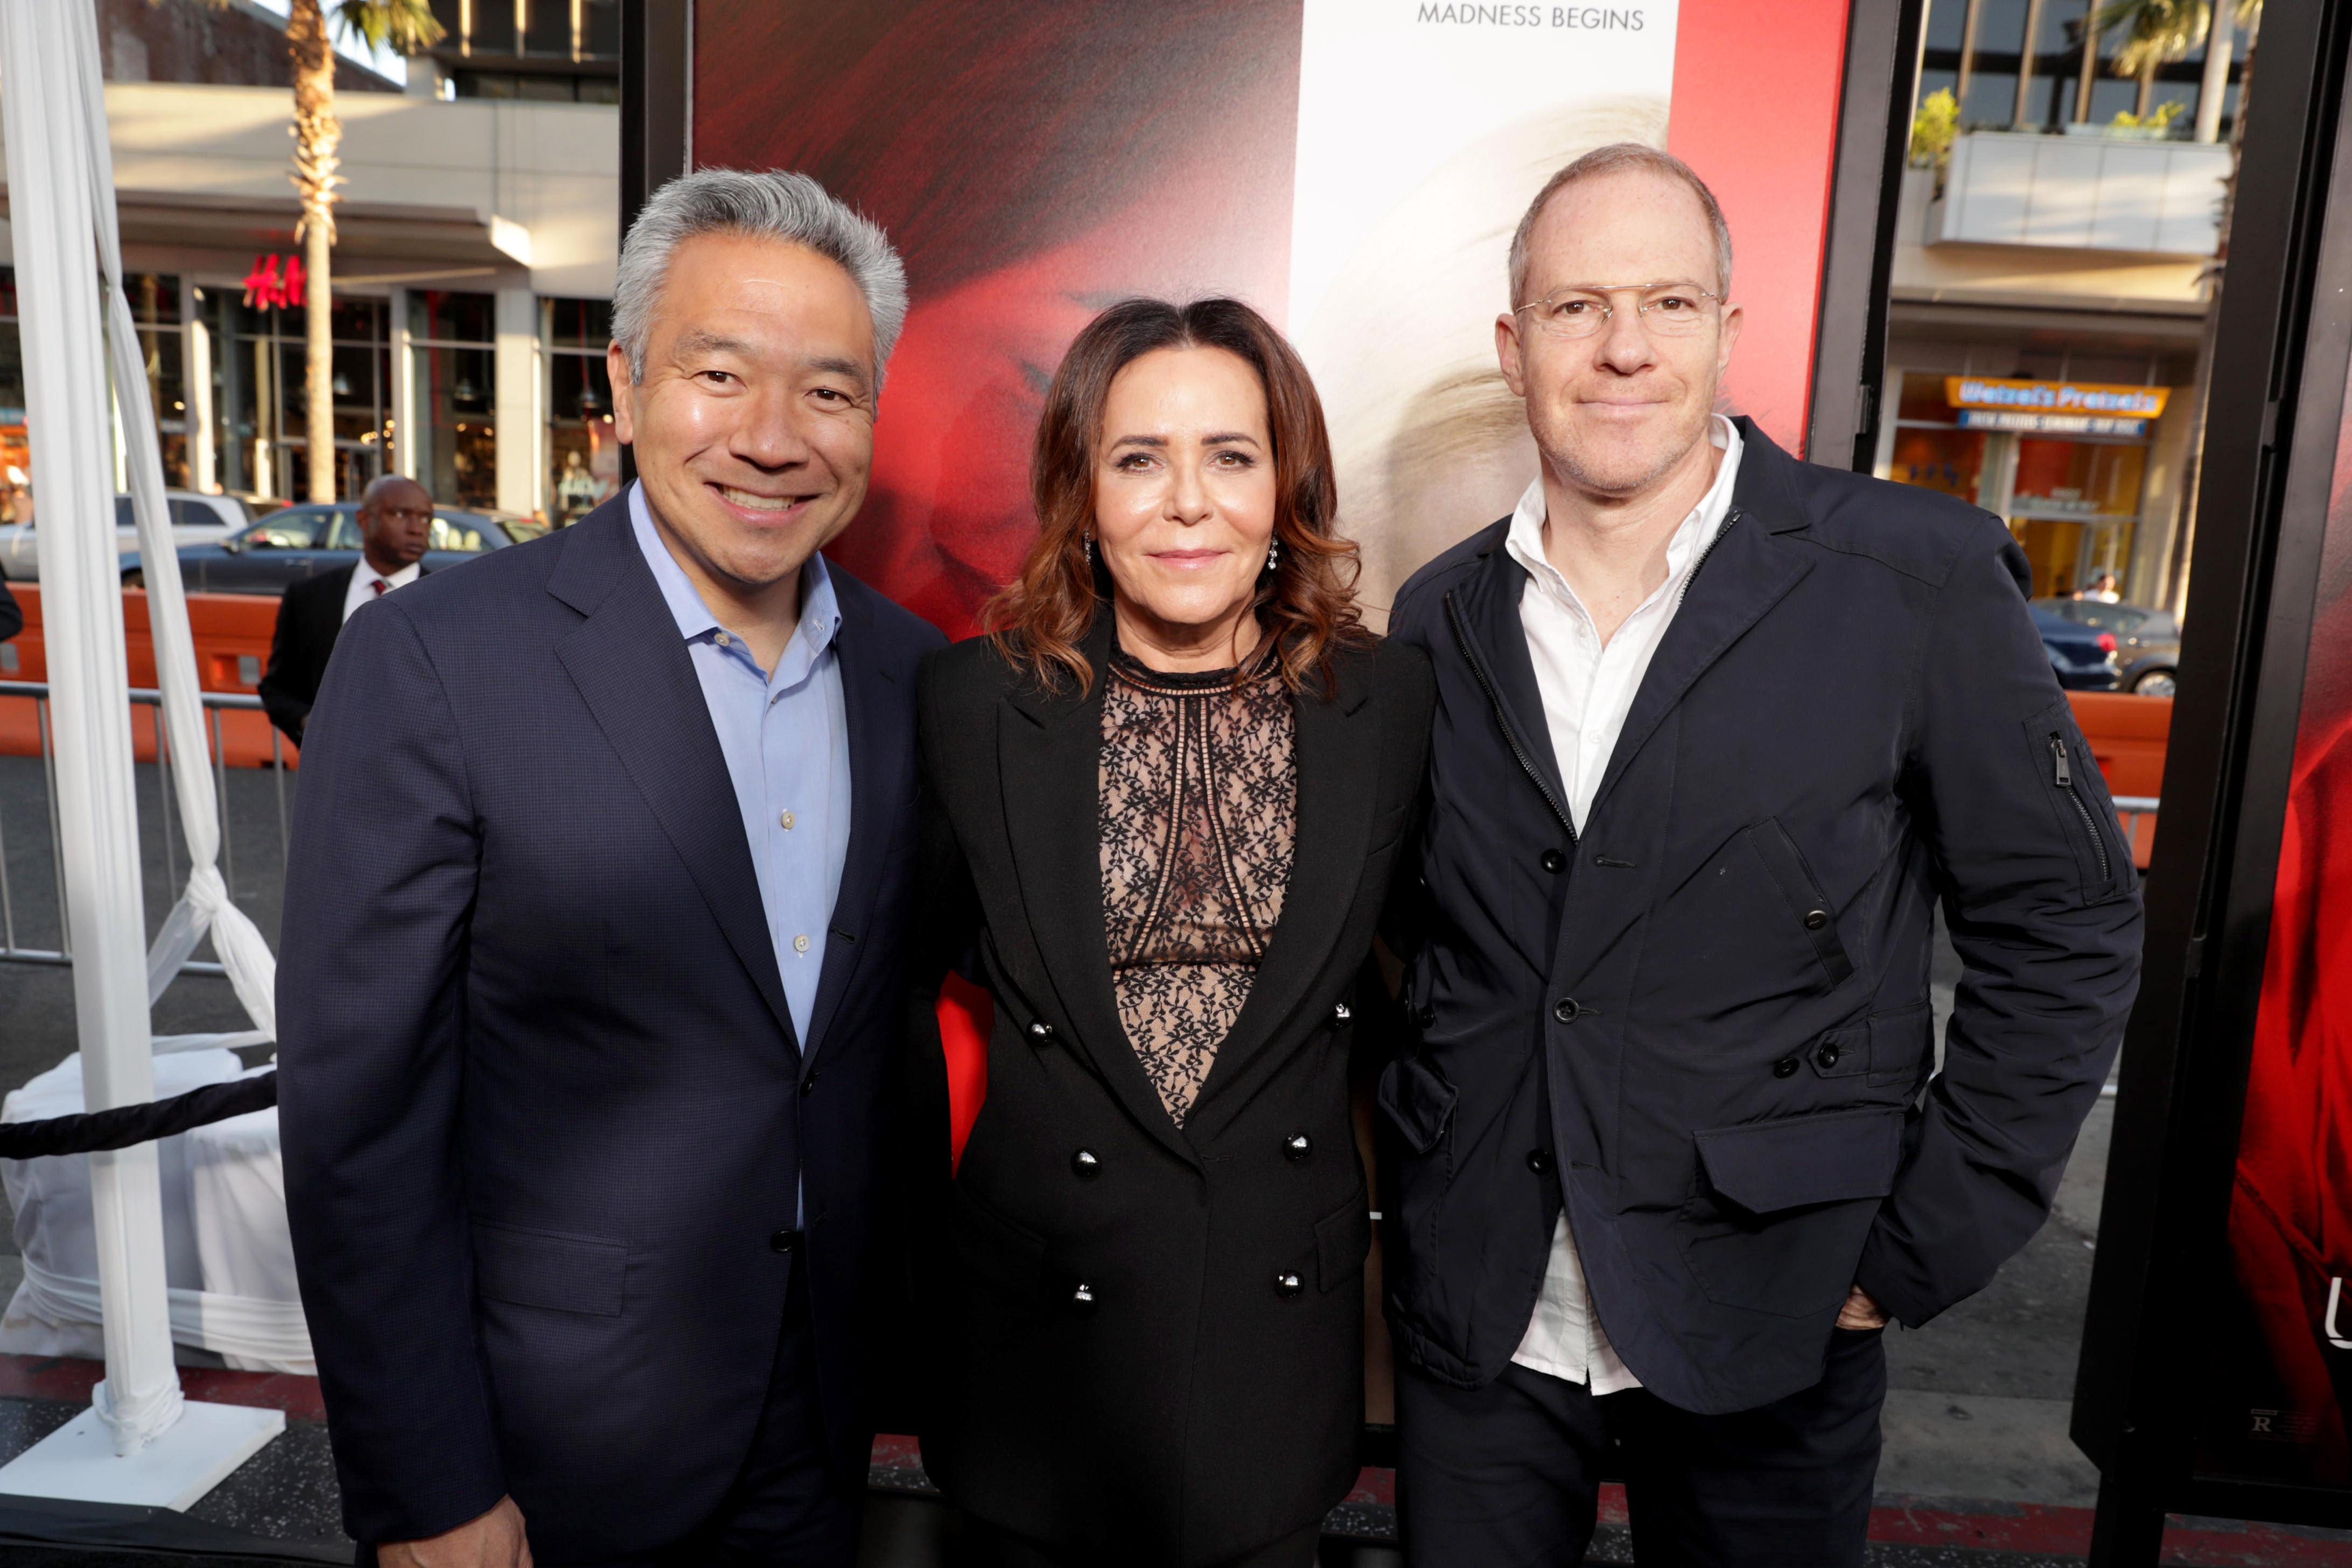 Kevin Tsujihara, Denise Di Novi, Toby Emmerich'Unforgettable' film premiere, Arrivals, Los Angeles, USA - 18 Apr 2017